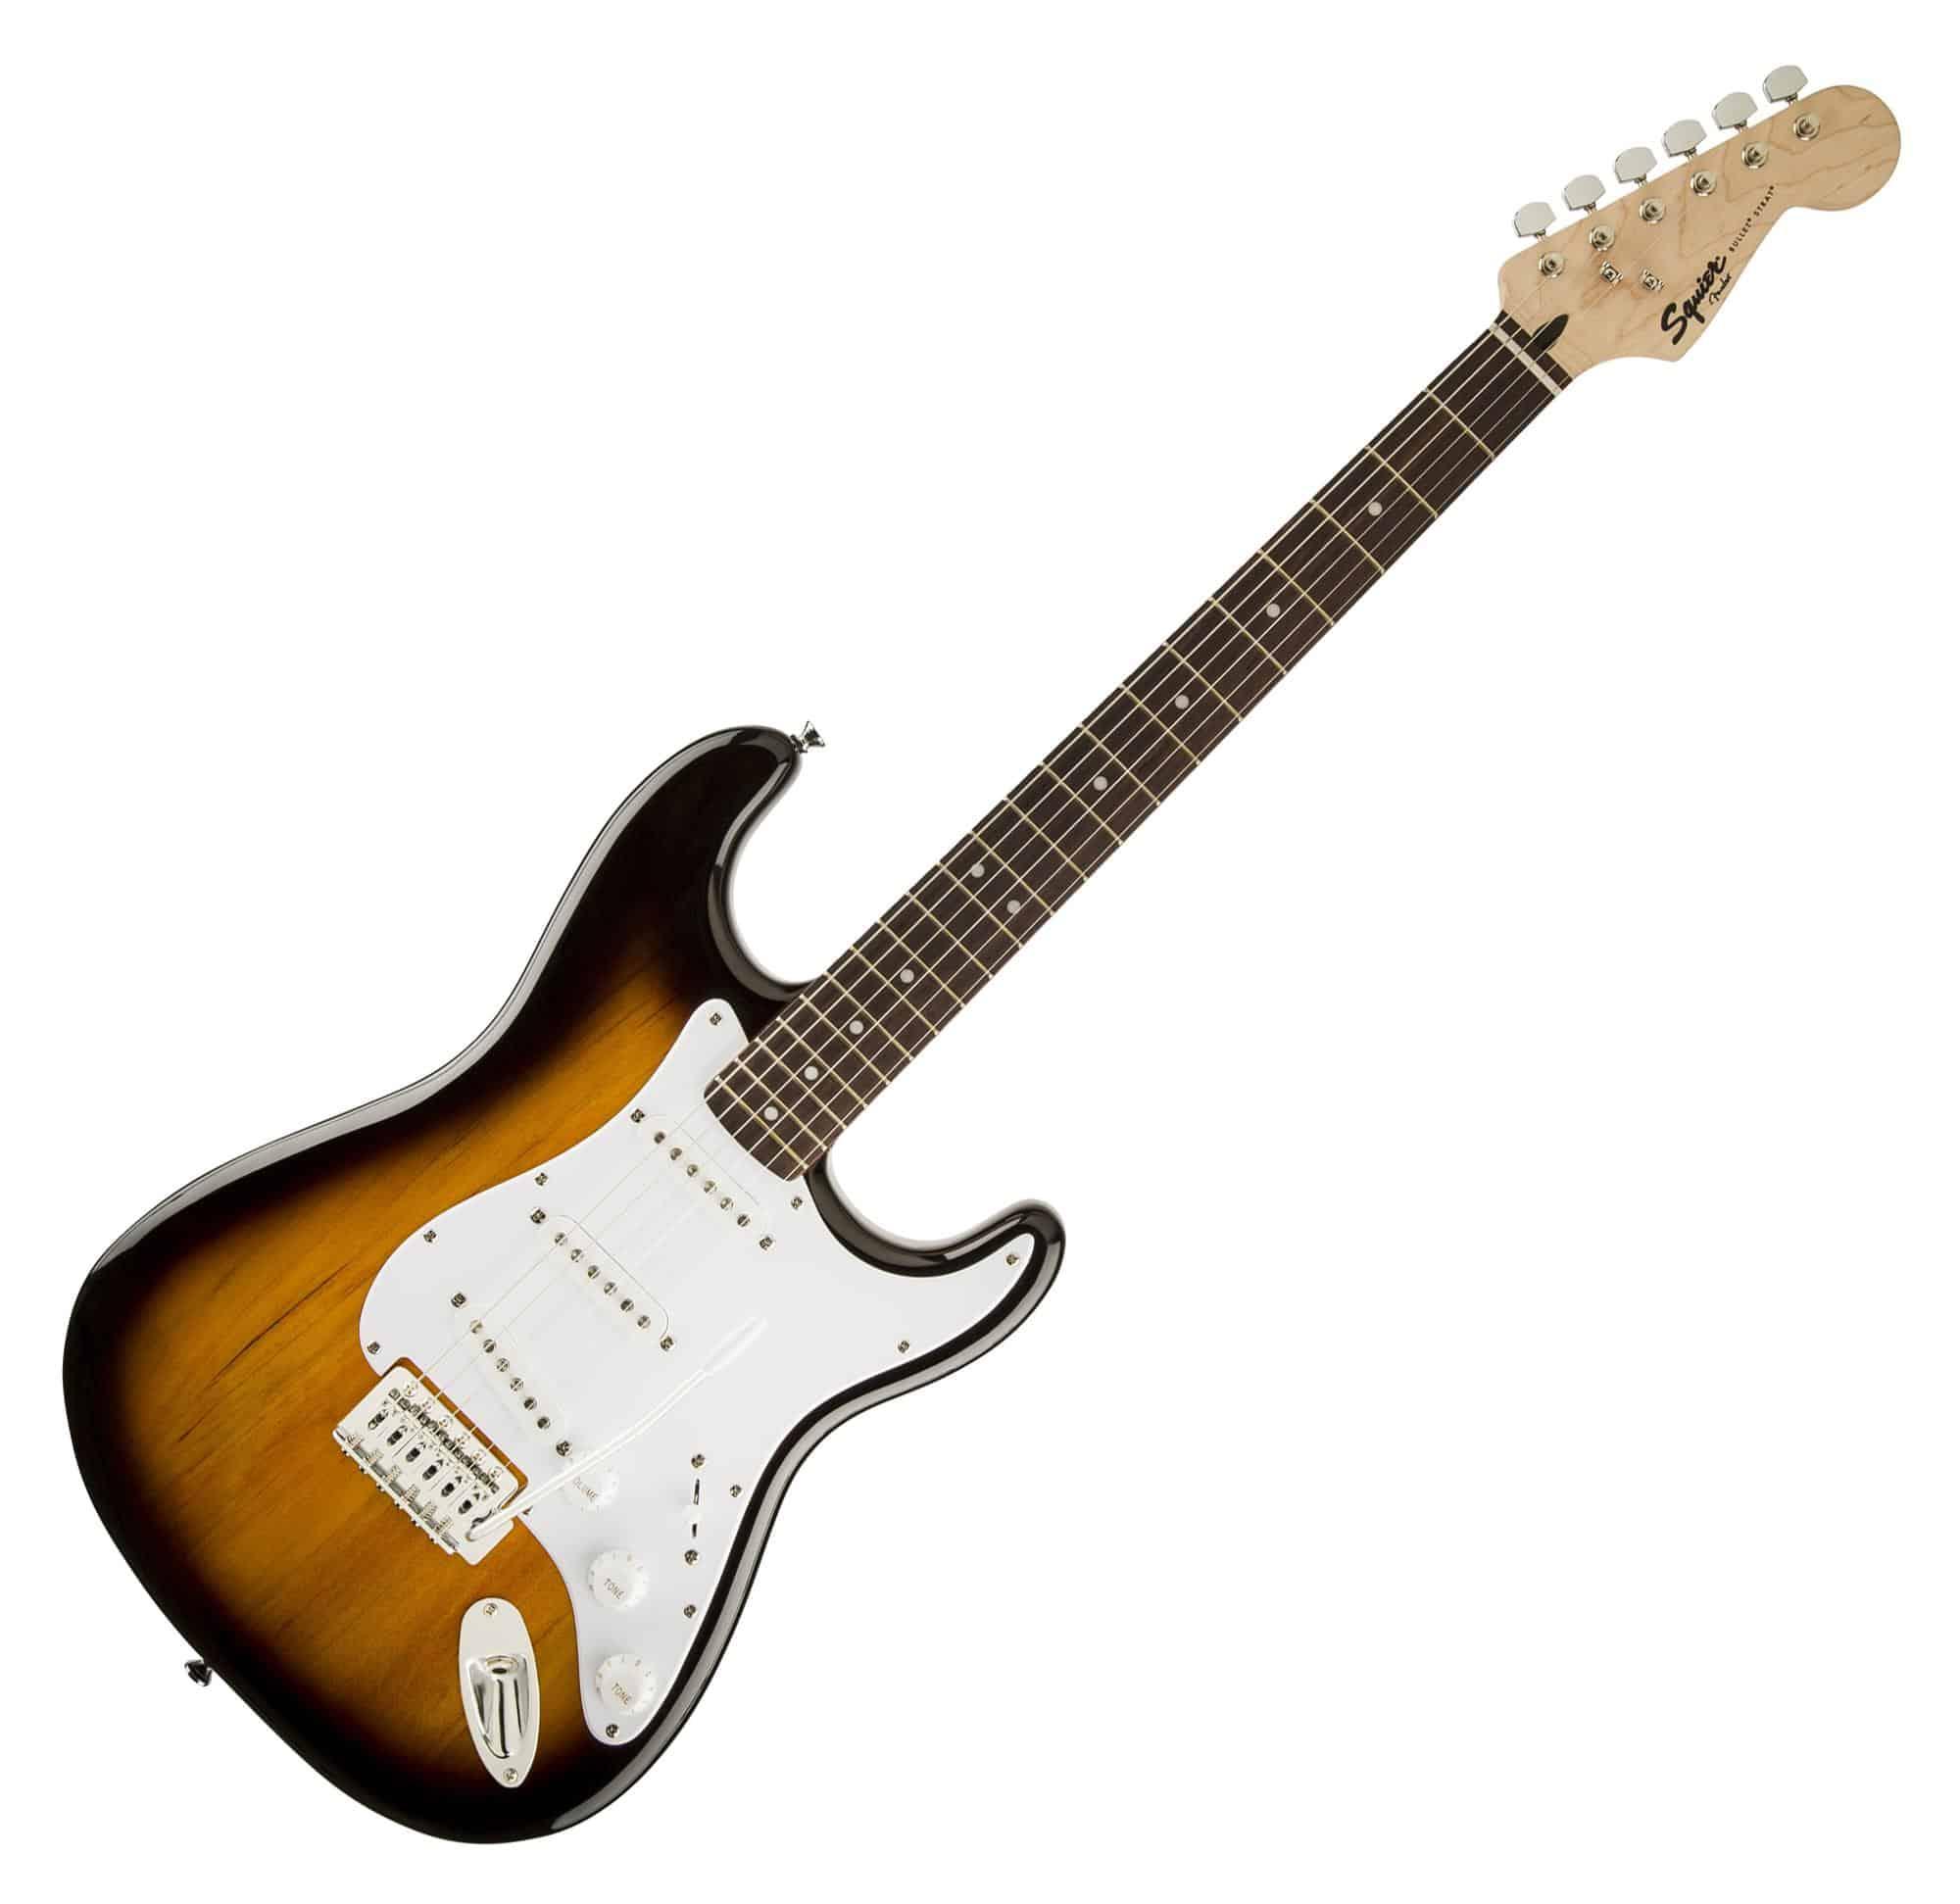 Fender Squier Bullet Strat IL BSB